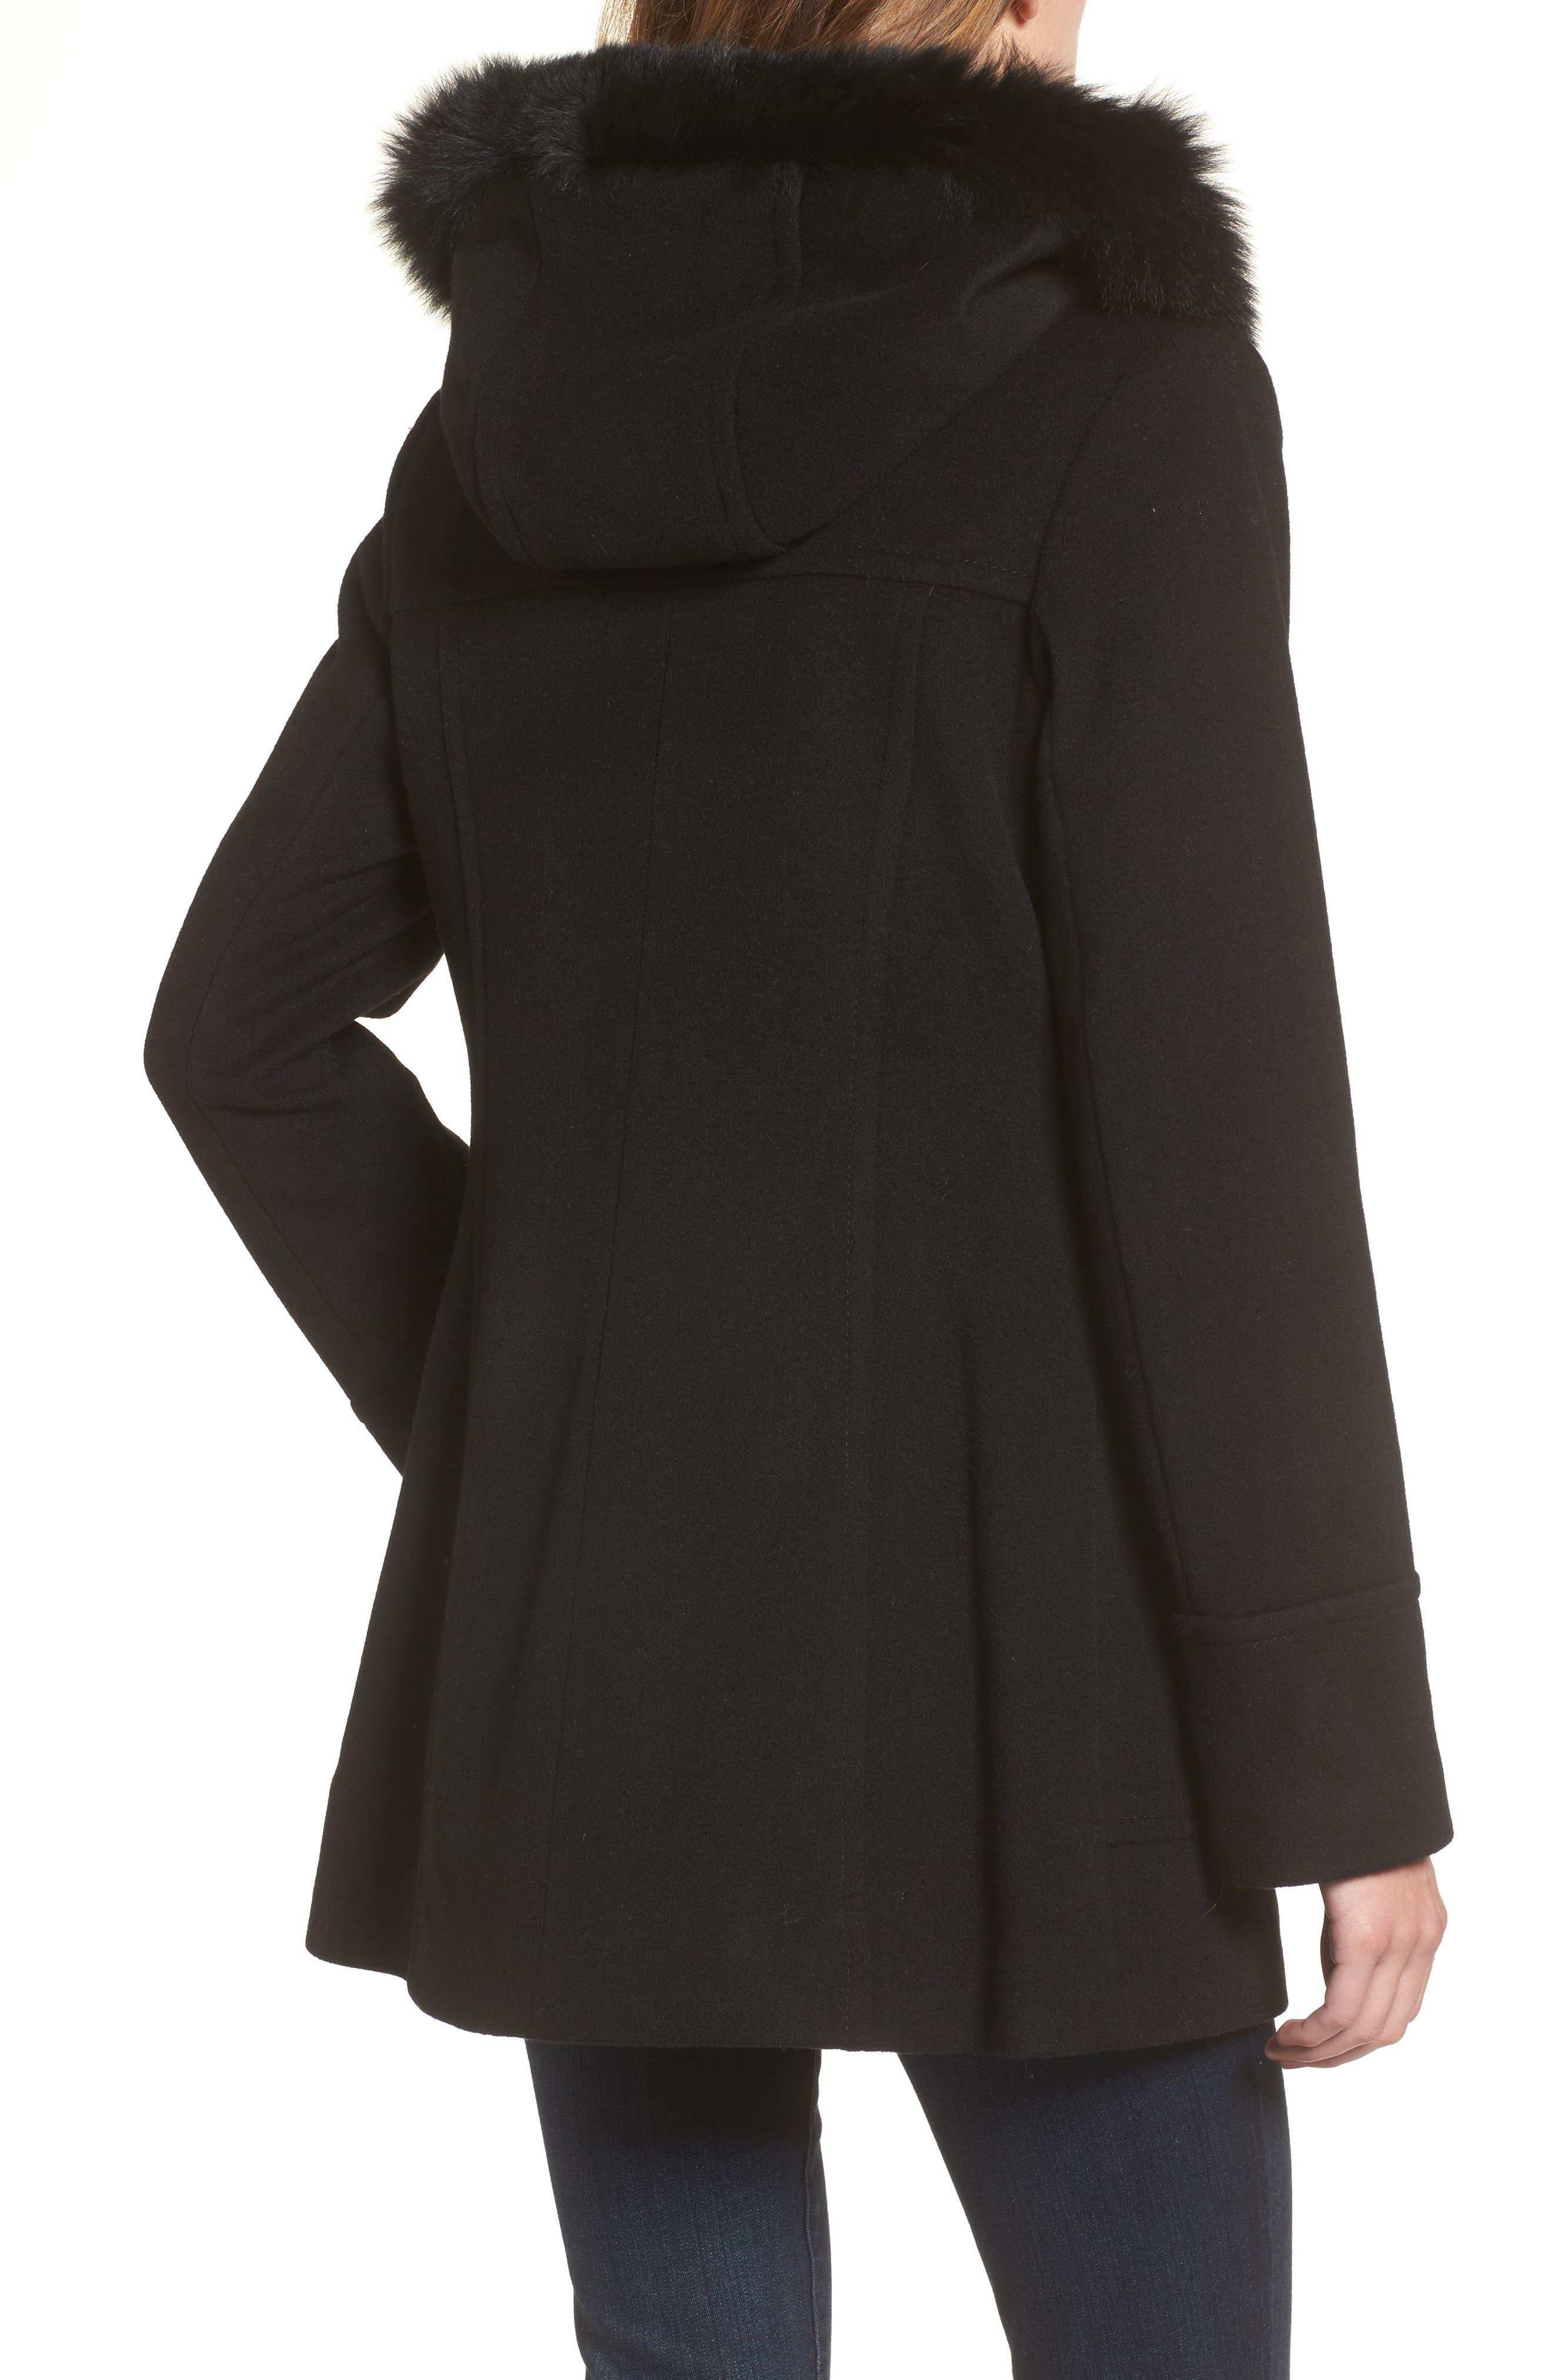 Hooded Wool Blend Coat with Genuine Fox Fur Trim,                             Alternate thumbnail 2, color,                             Black